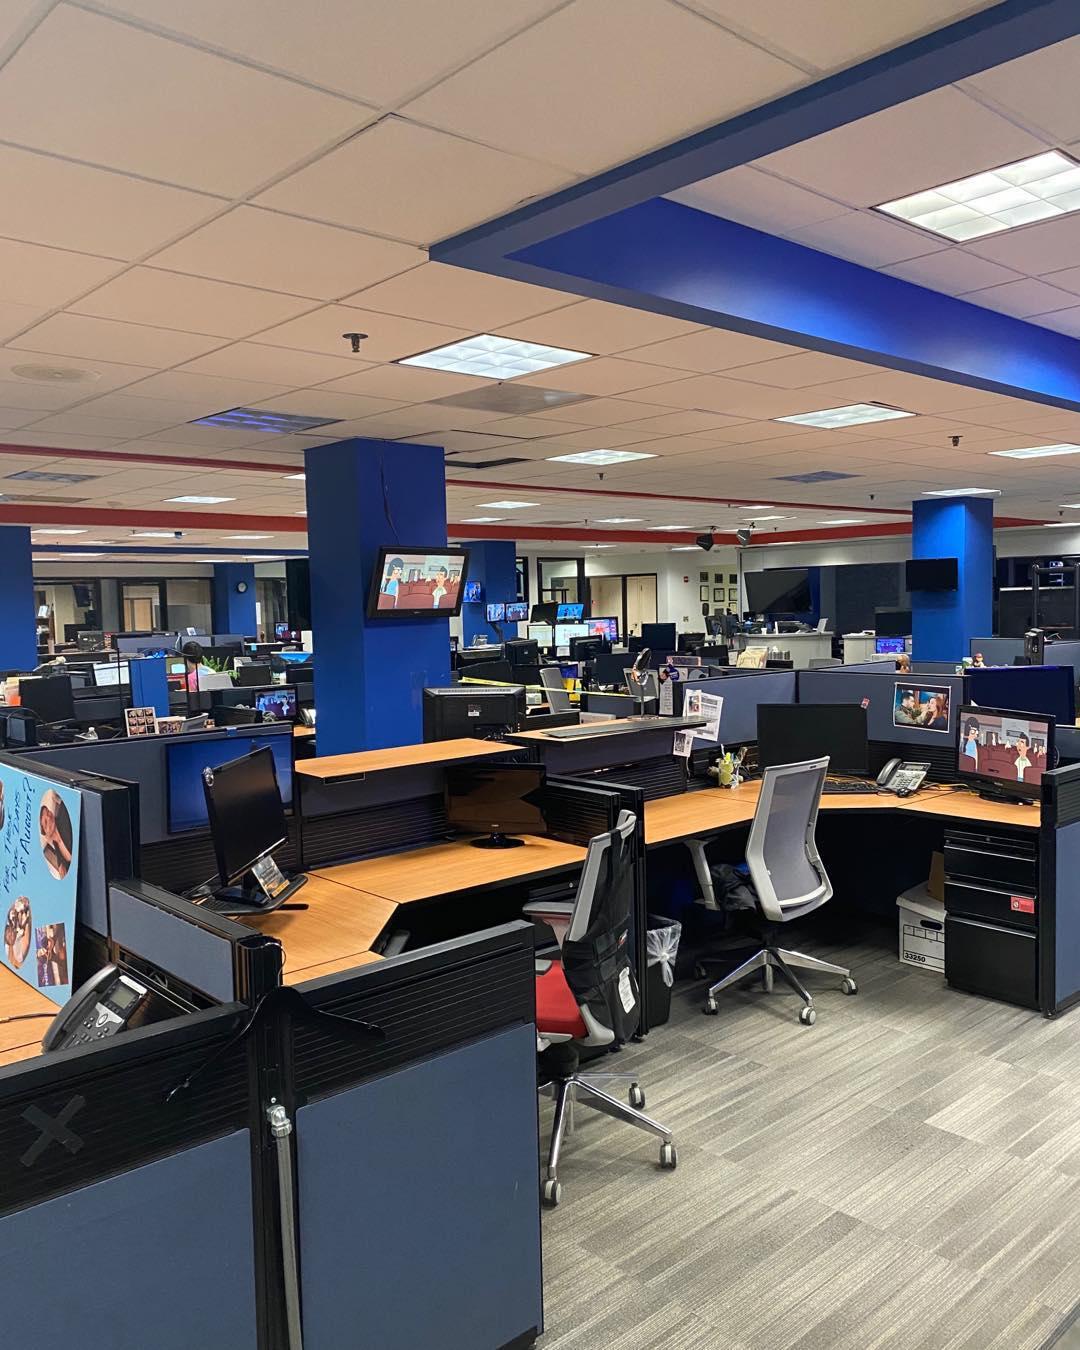 The empty Fox 5 newsroom. Photo courtesy of DC Public Library.